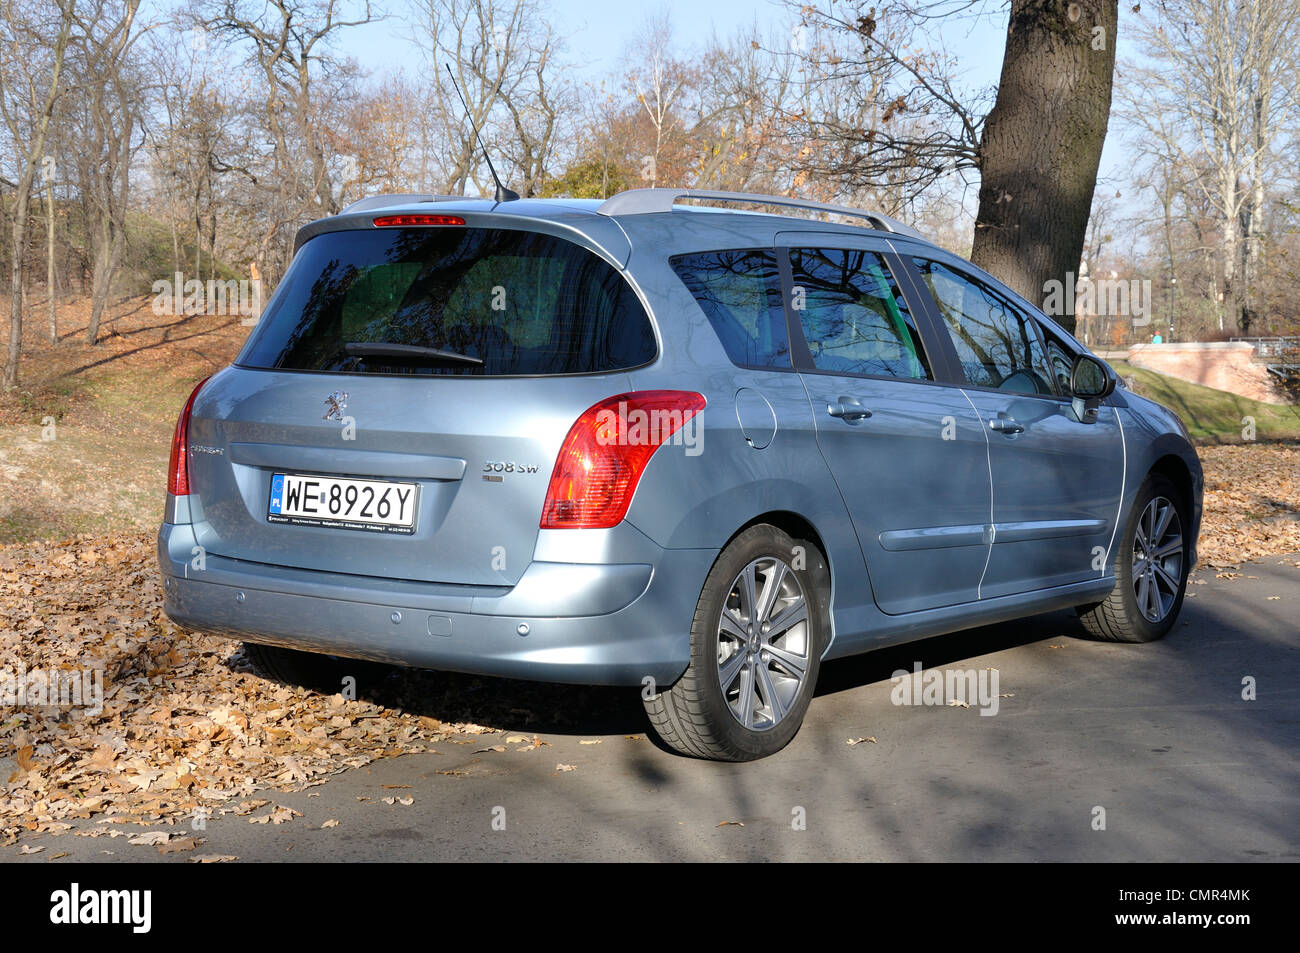 Peugeot 308 SW - MY 2007 (FL 2011) - French popular lower-medium class car (segment C) - at park Stock Photo